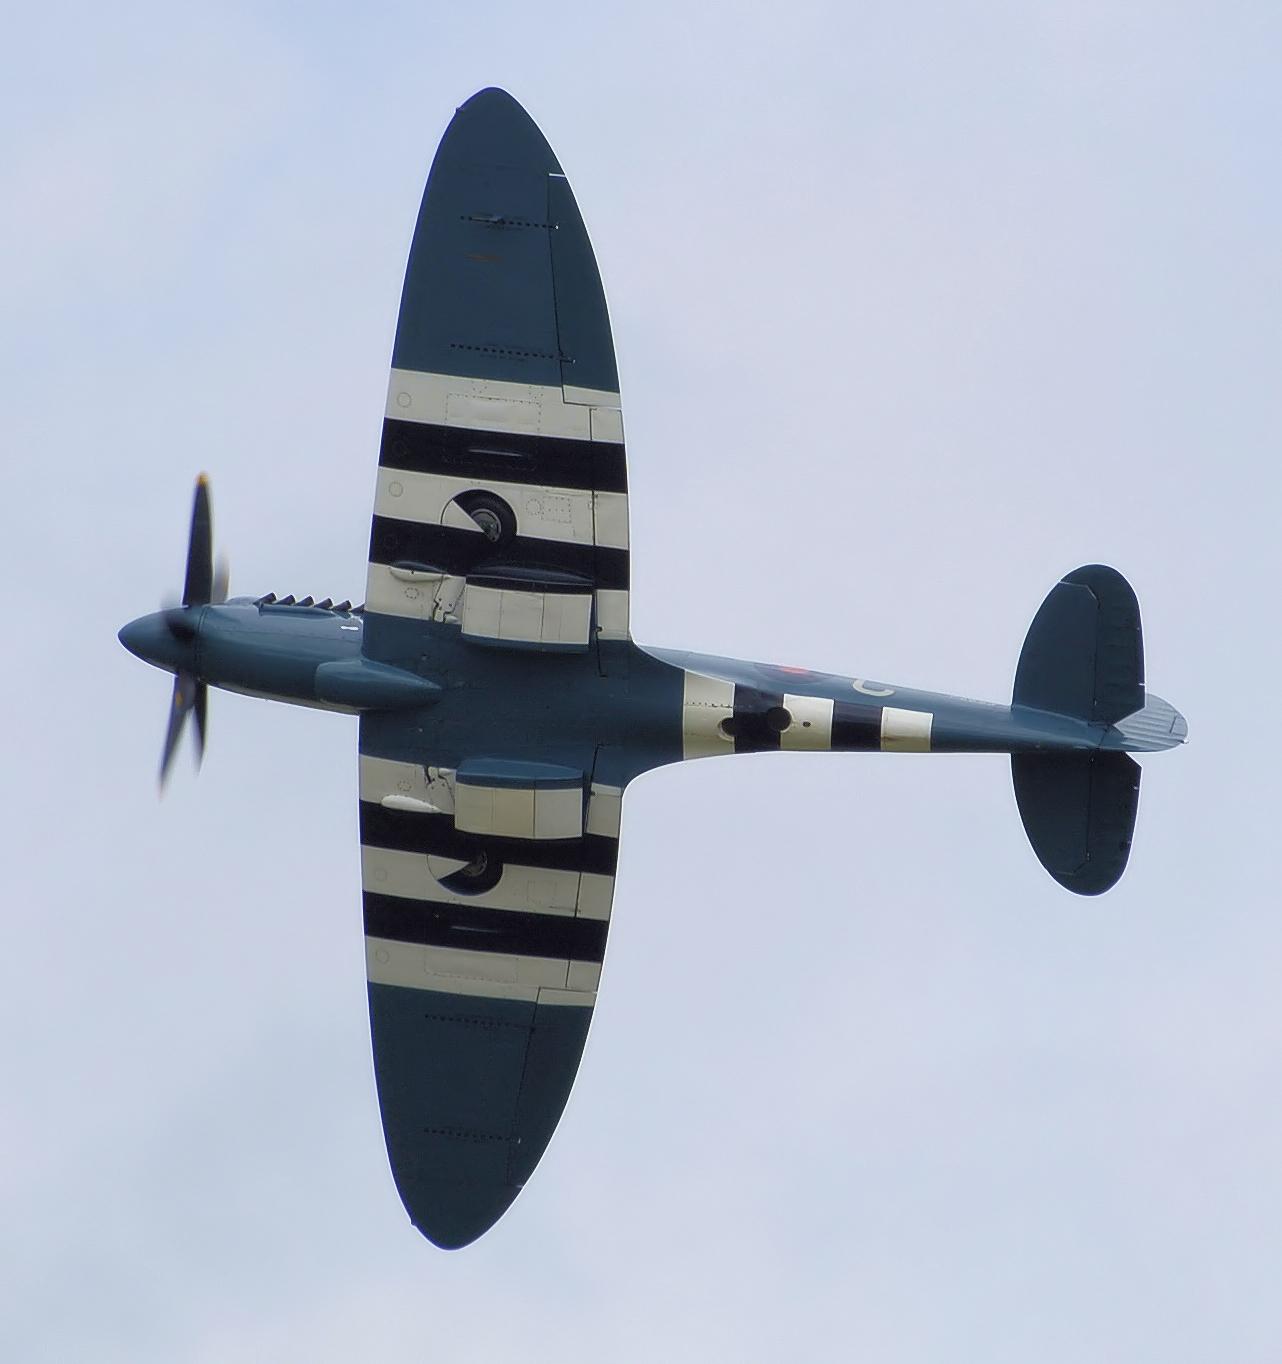 File:Spitfire mark19 ps853 planform arp.jpg - Wikimedia ...